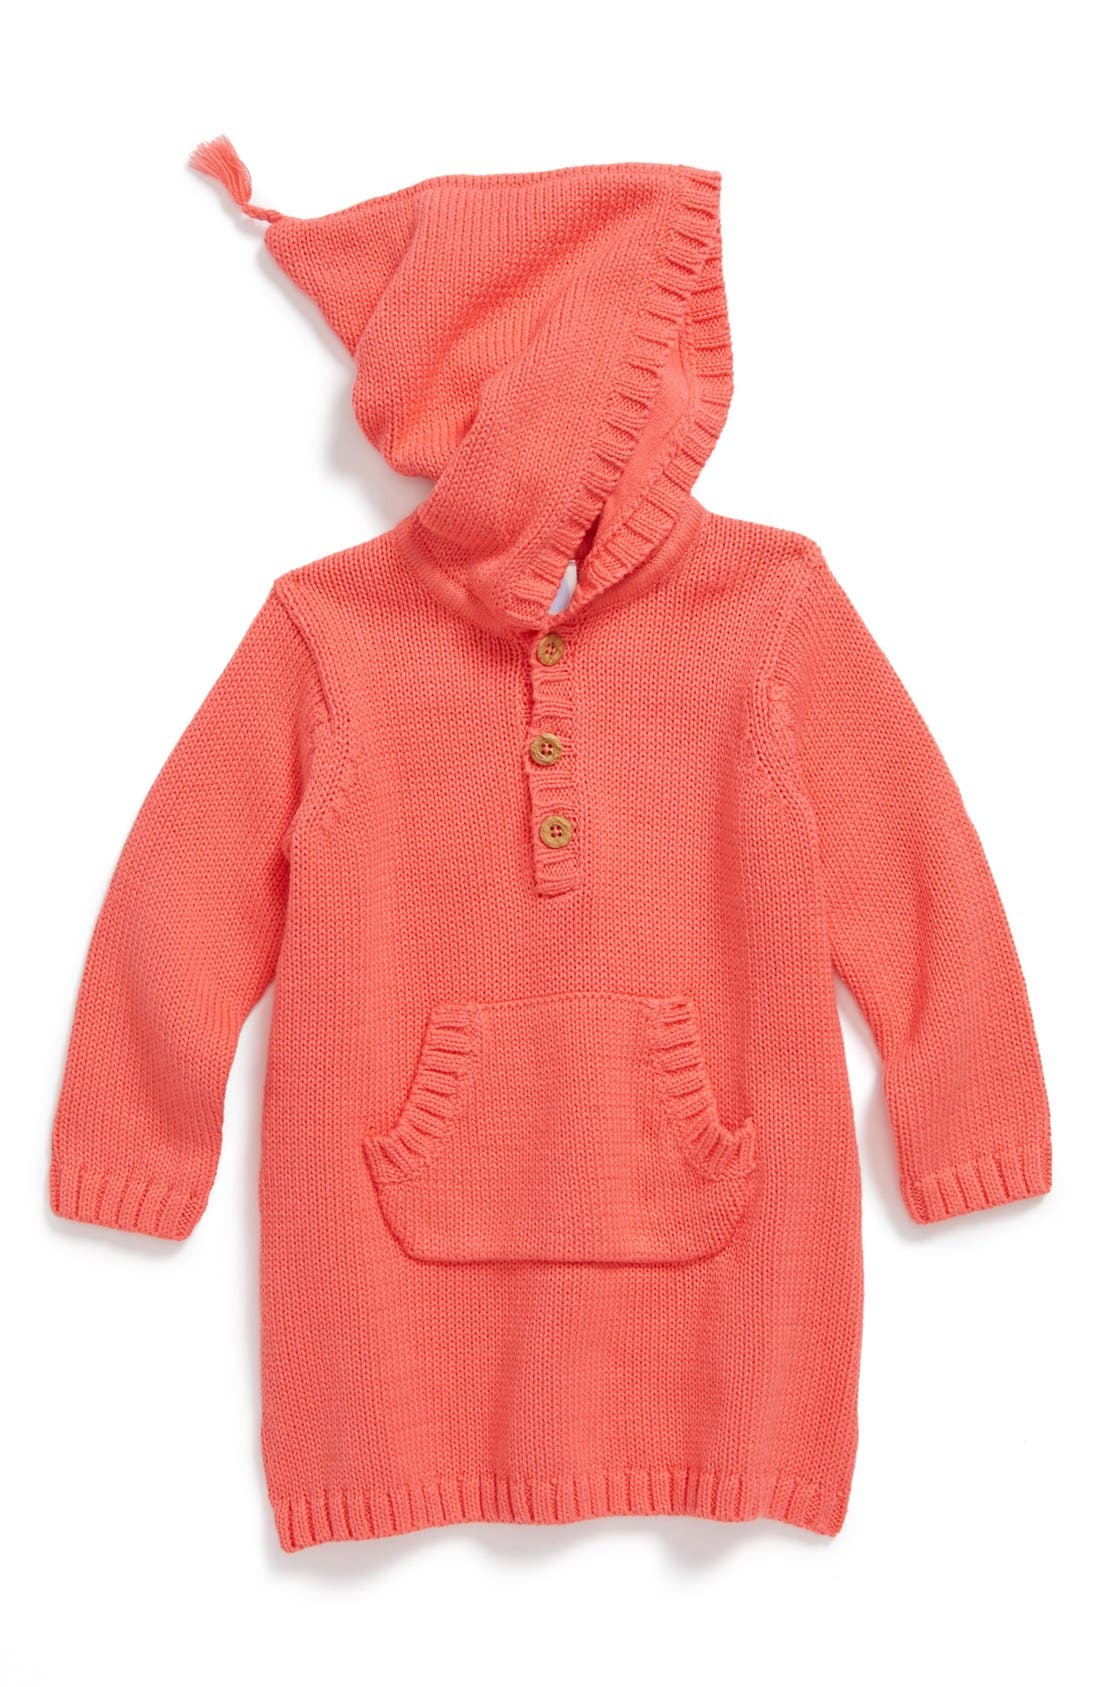 Main Image - Stem Baby Hooded Organic Cotton Sweater Dress (Baby Girls)